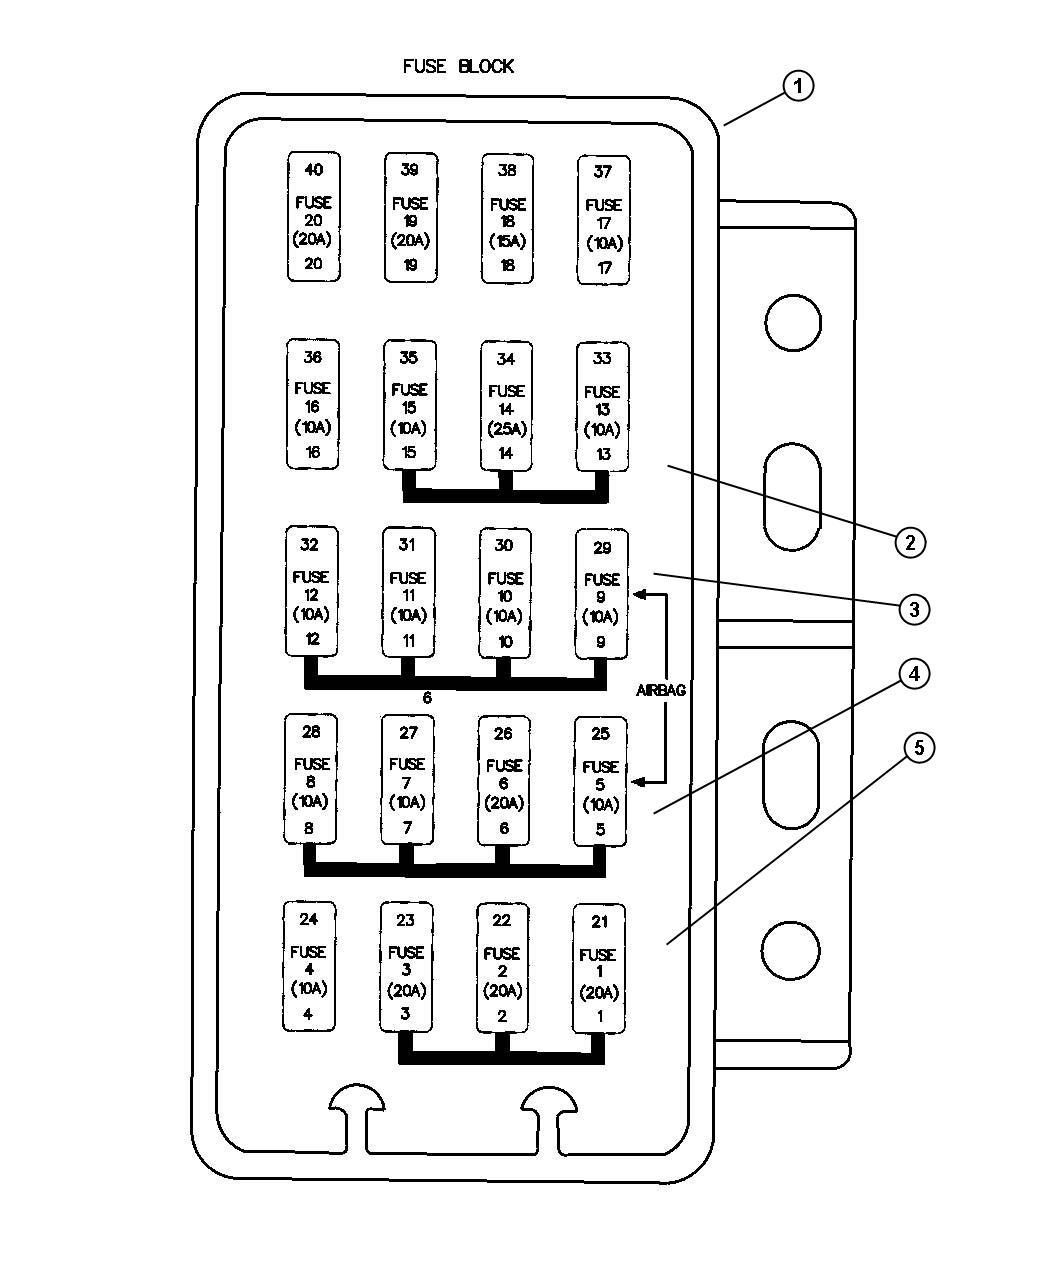 2012 lincoln mkz wiring diagram